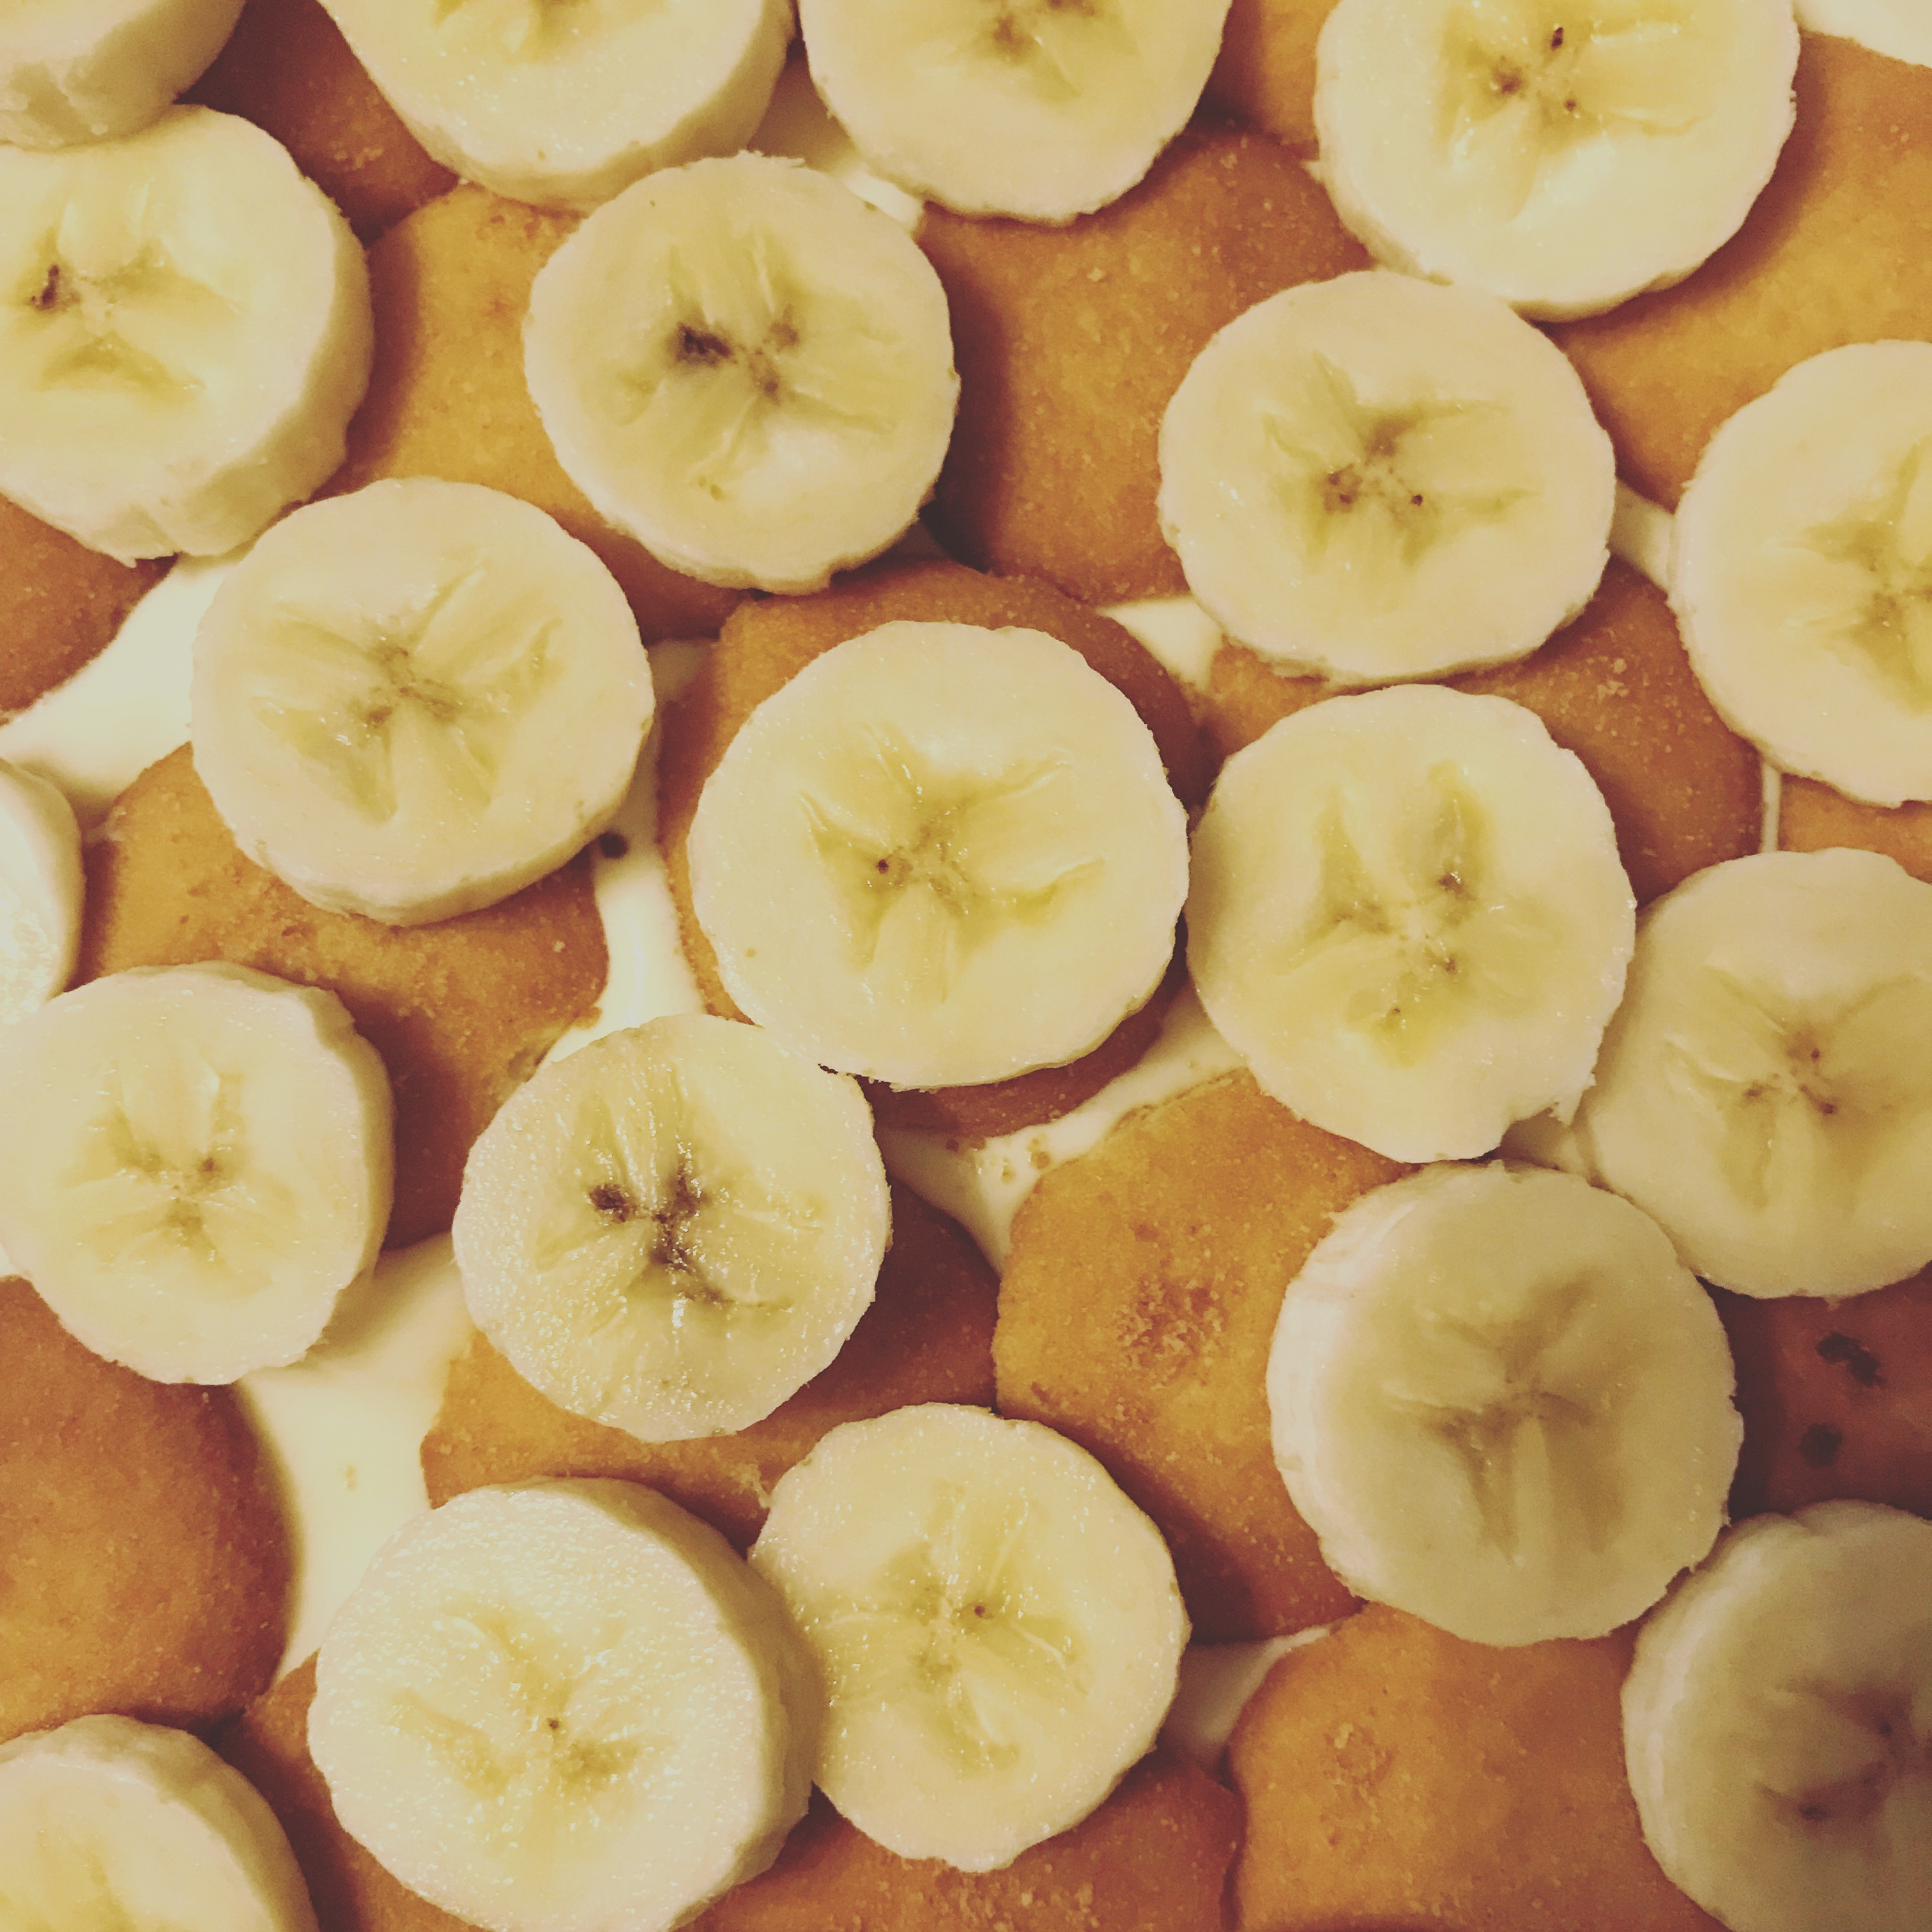 Joyful Week at Proof & Parchment no. 9: Banana Pudding